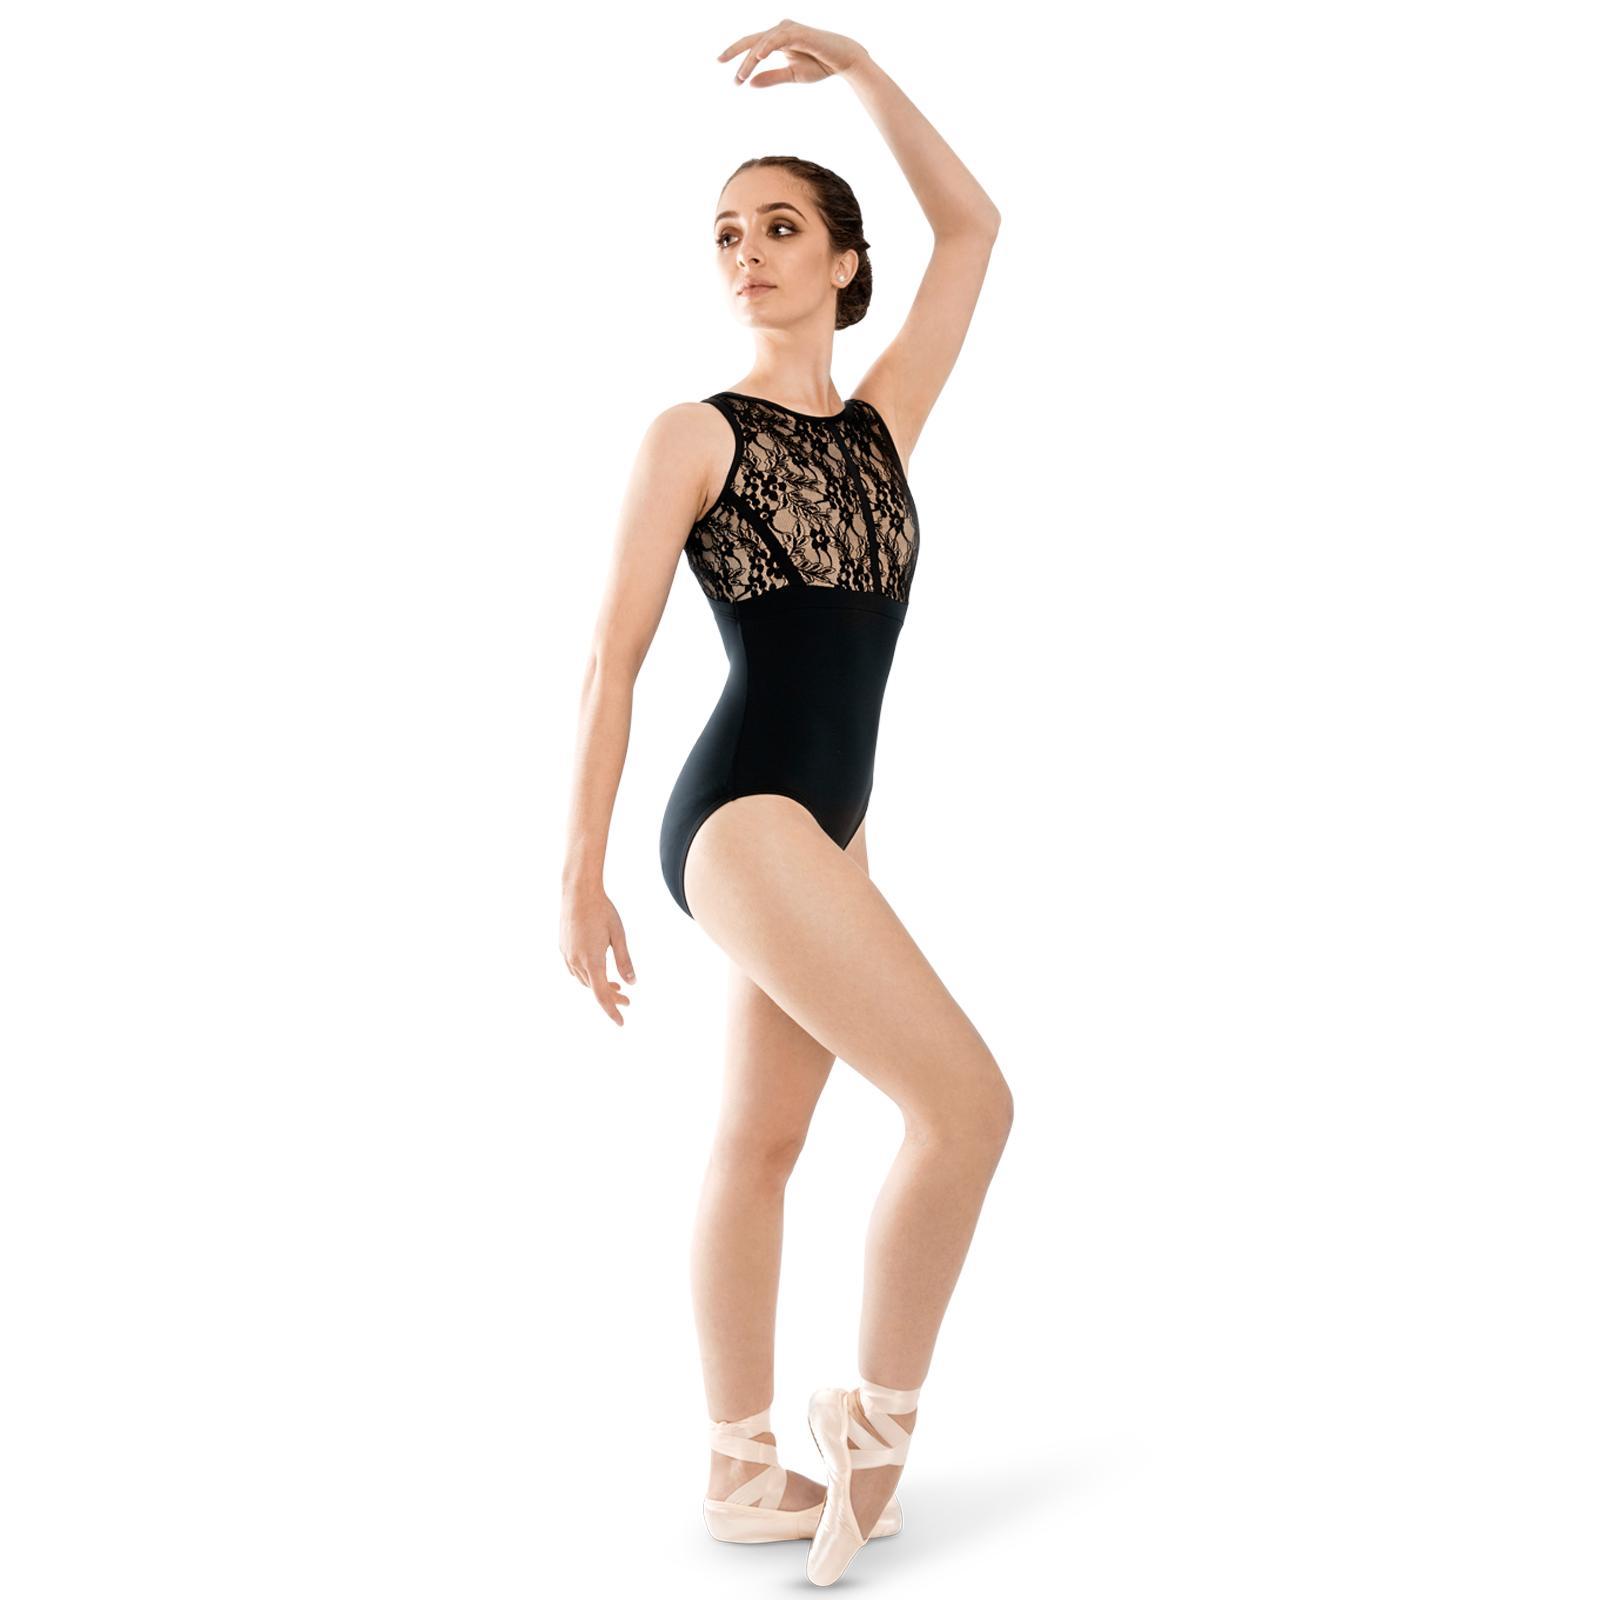 ffd2aa83a206c Strut Stuff Demi Leotard – Black - Dance Desire Dance Store